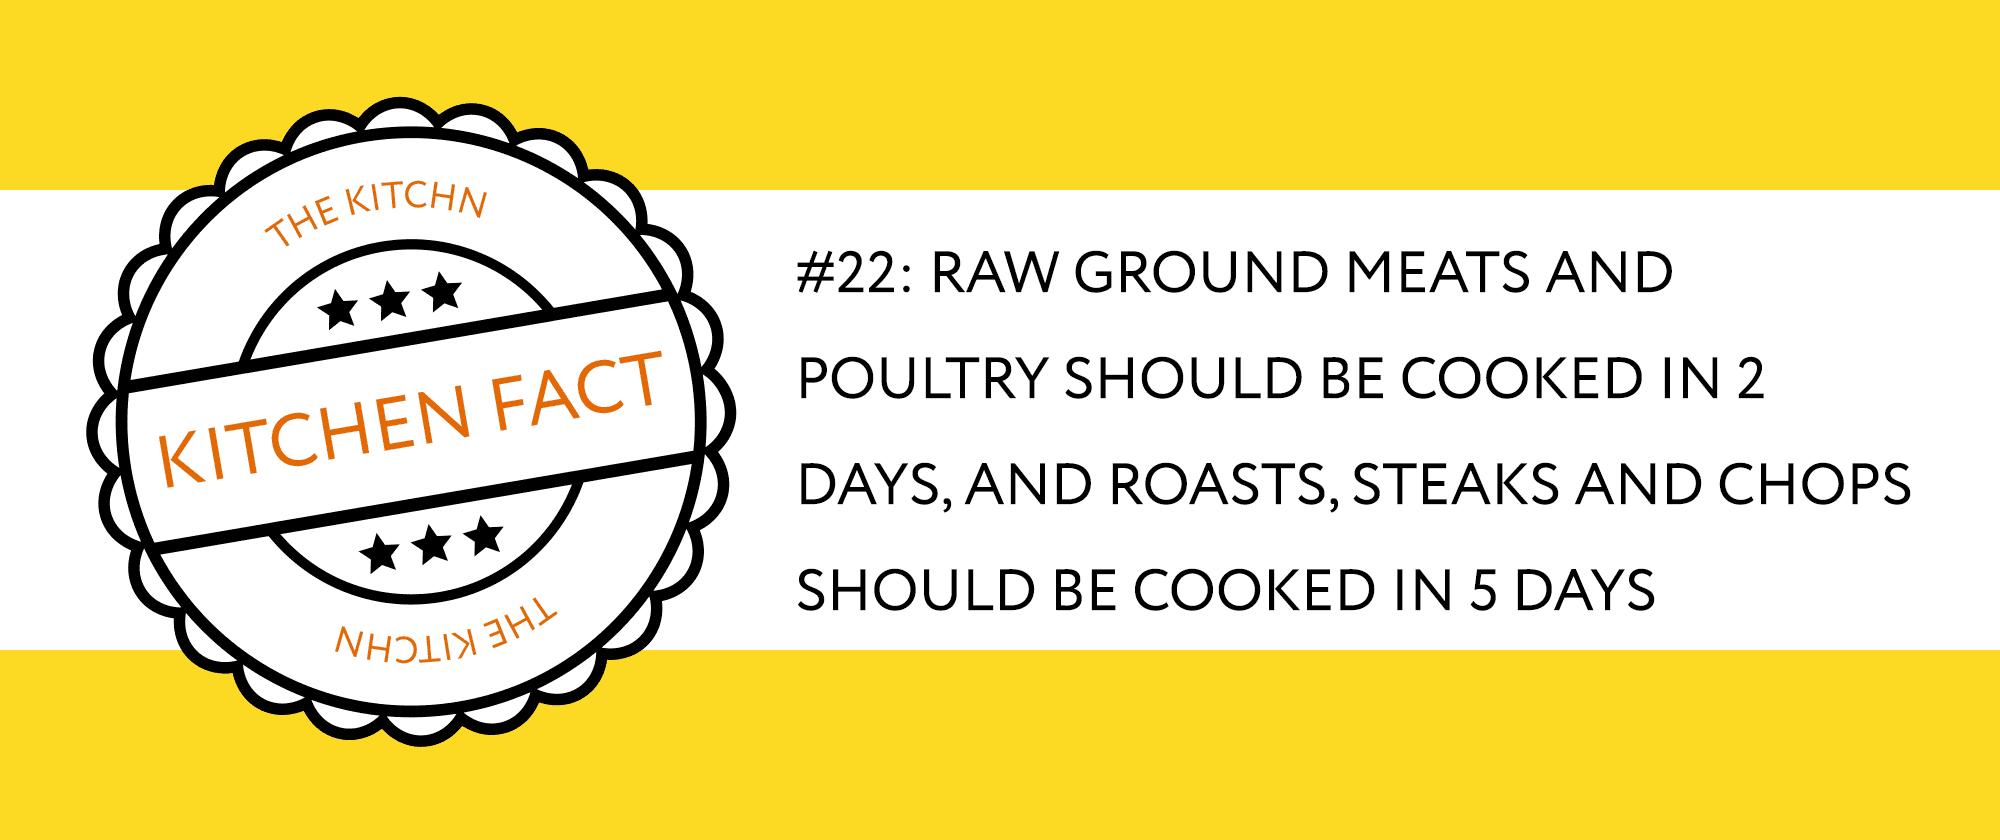 Kitchen Fact Storing Meat